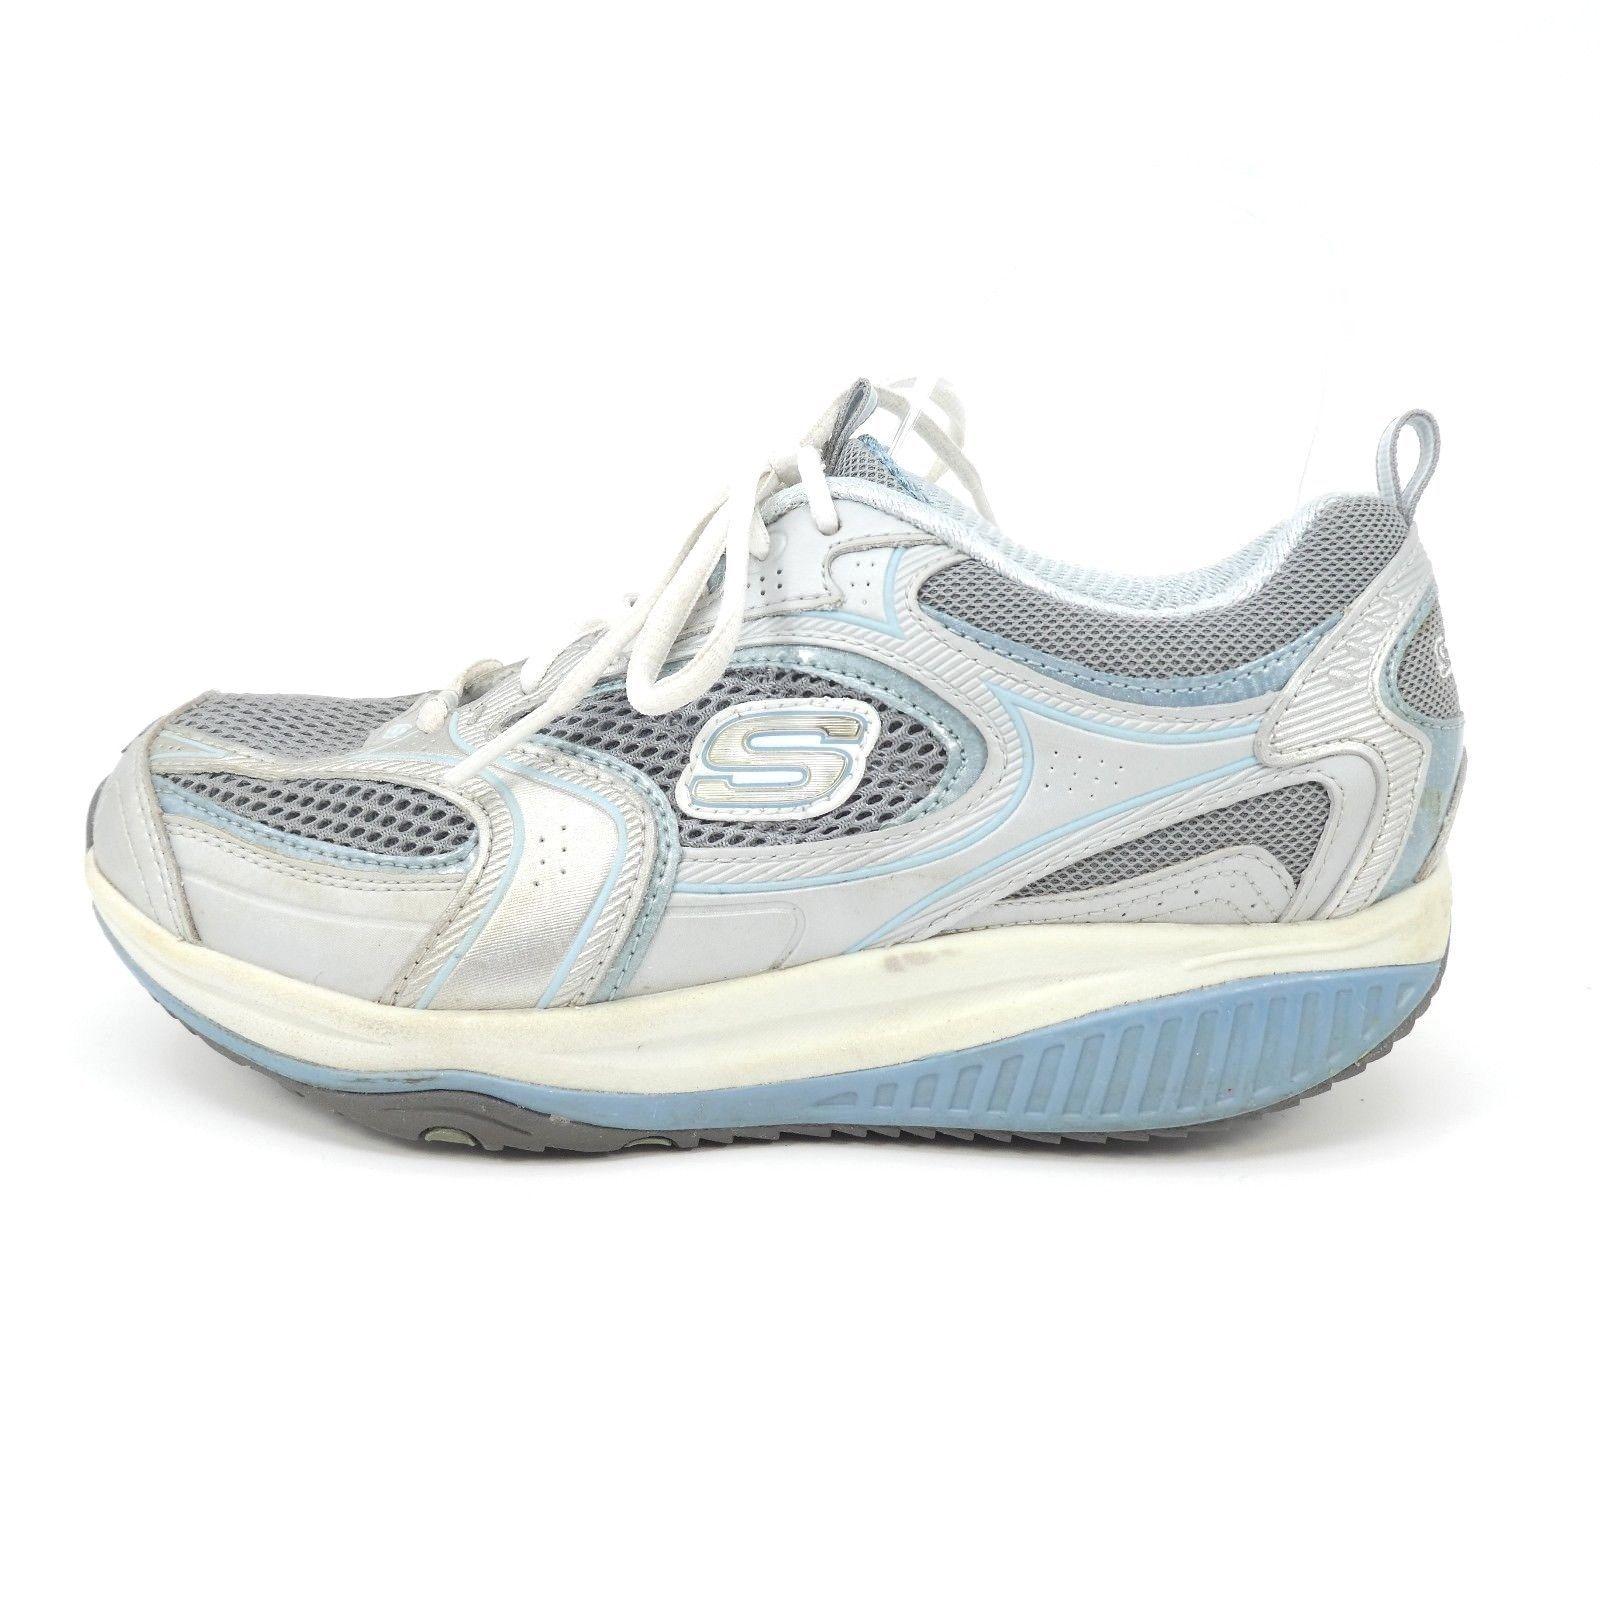 Skechers Shape Ups 2.0 Perfect Comfort, Womens Fitness Shoes